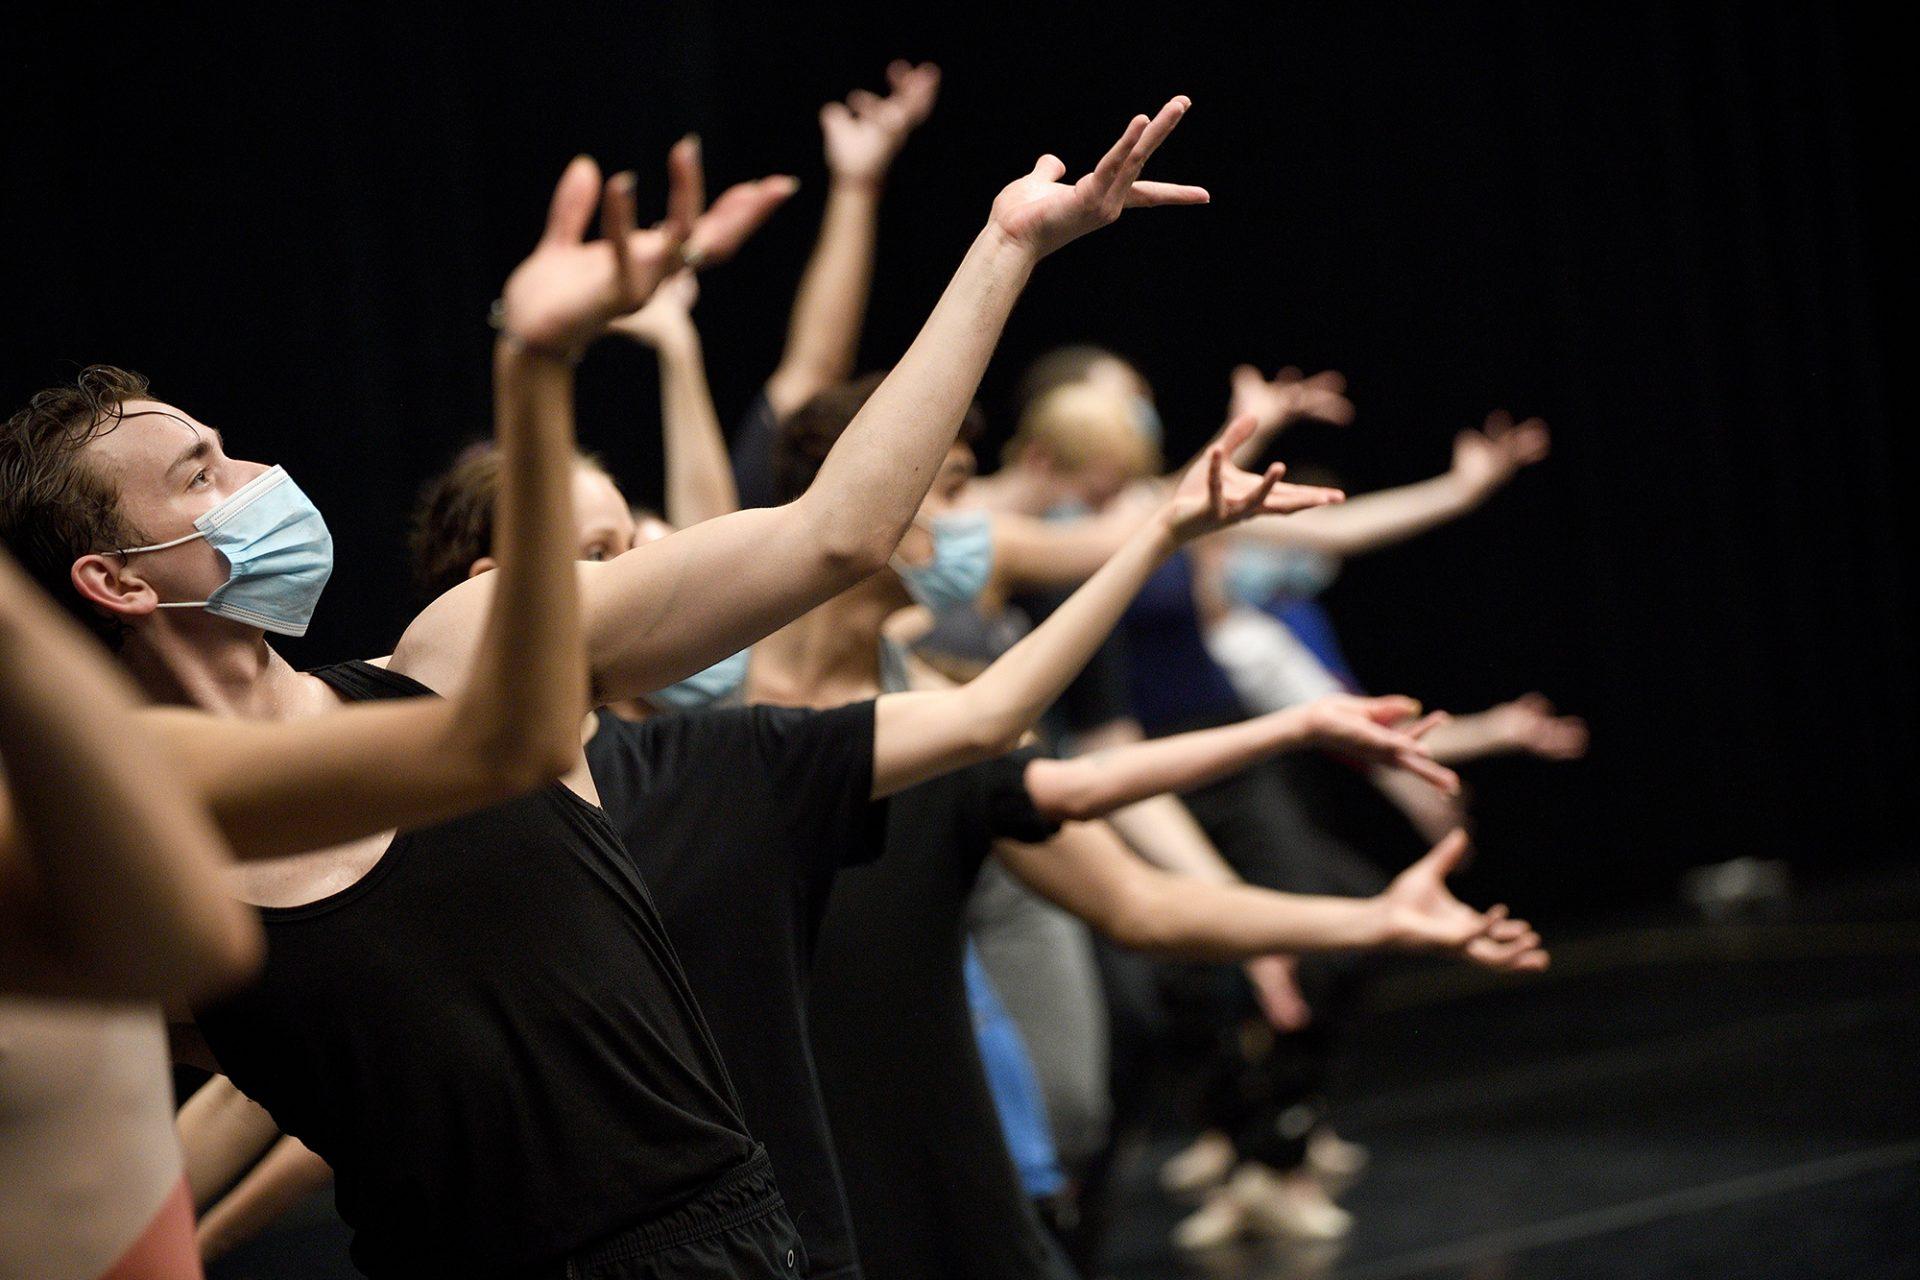 English-National-Ballet-dancers-in-rehearsal-for-Creature-by-Akram-Khan-©-Laurent-Liotardo-2000x1333